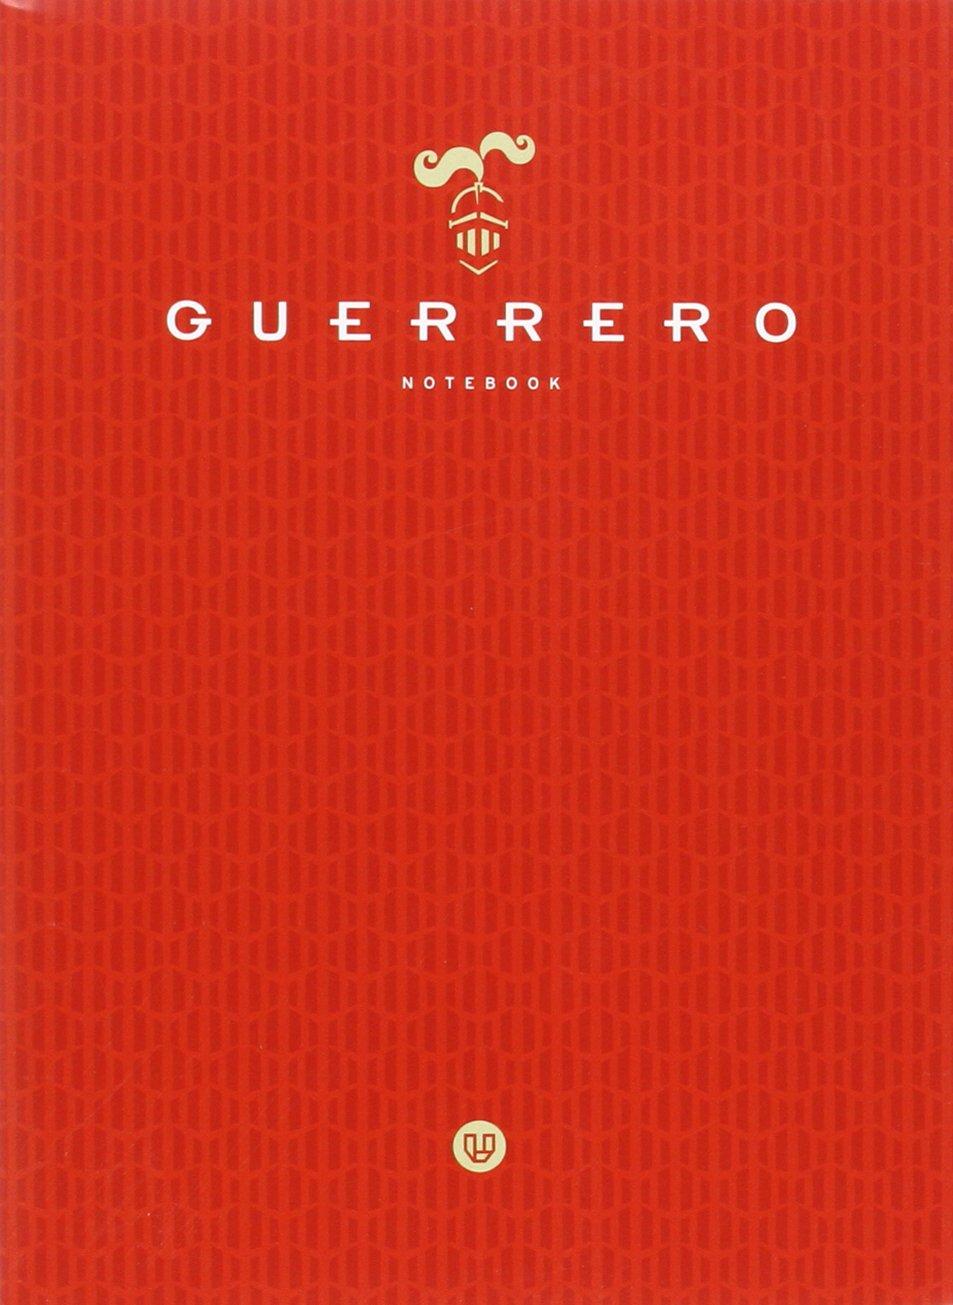 Guerrero 71334 - Libreta 4º, 30 hojas cuadriculadas 4 x 4